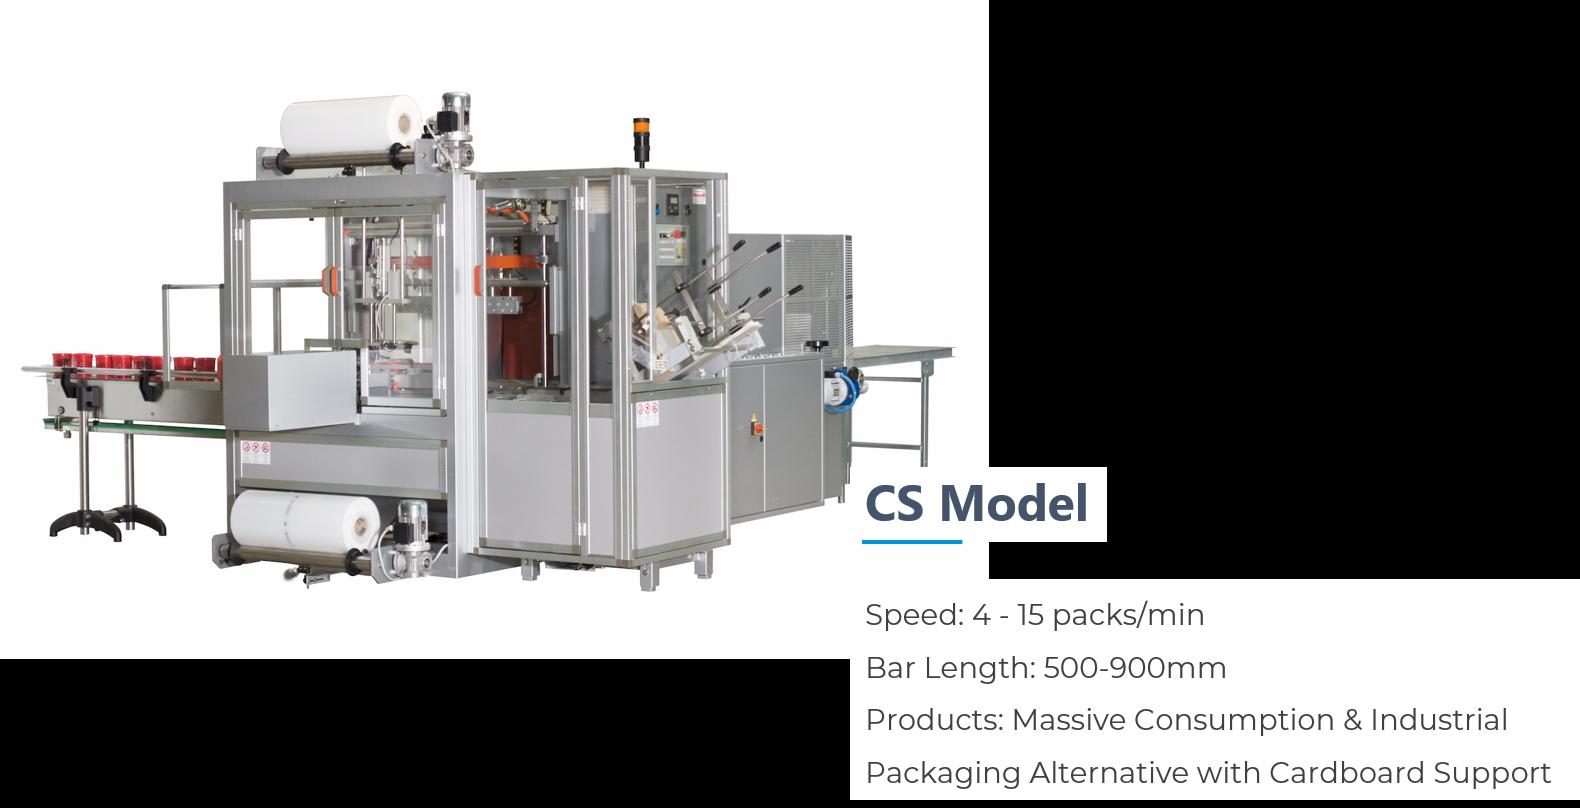 CS Model (Carrousel-PNG)